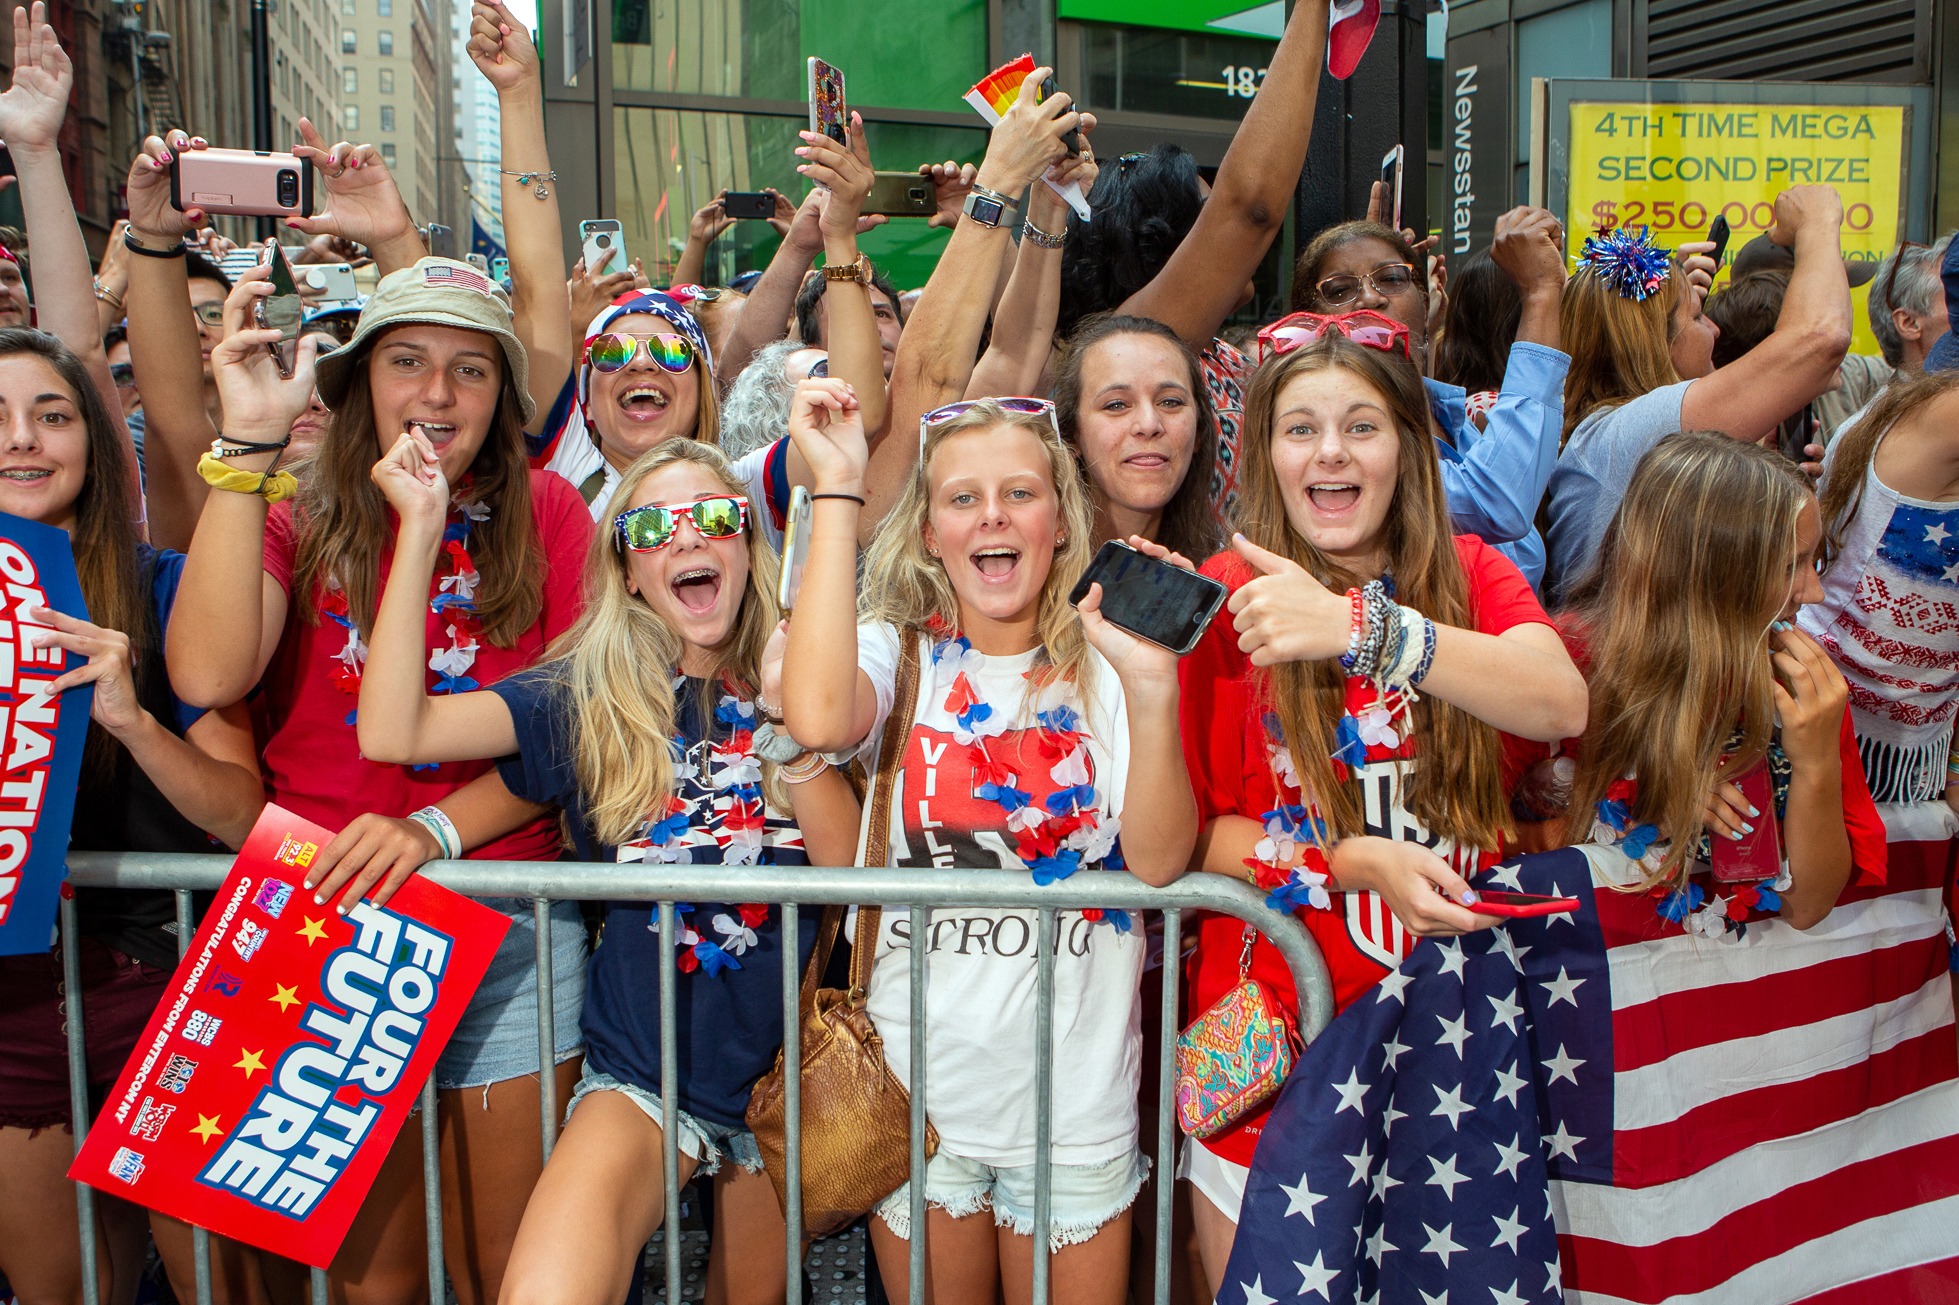 U.S. Women's Soccer Ticker-Tape Parade in NYC: Photos